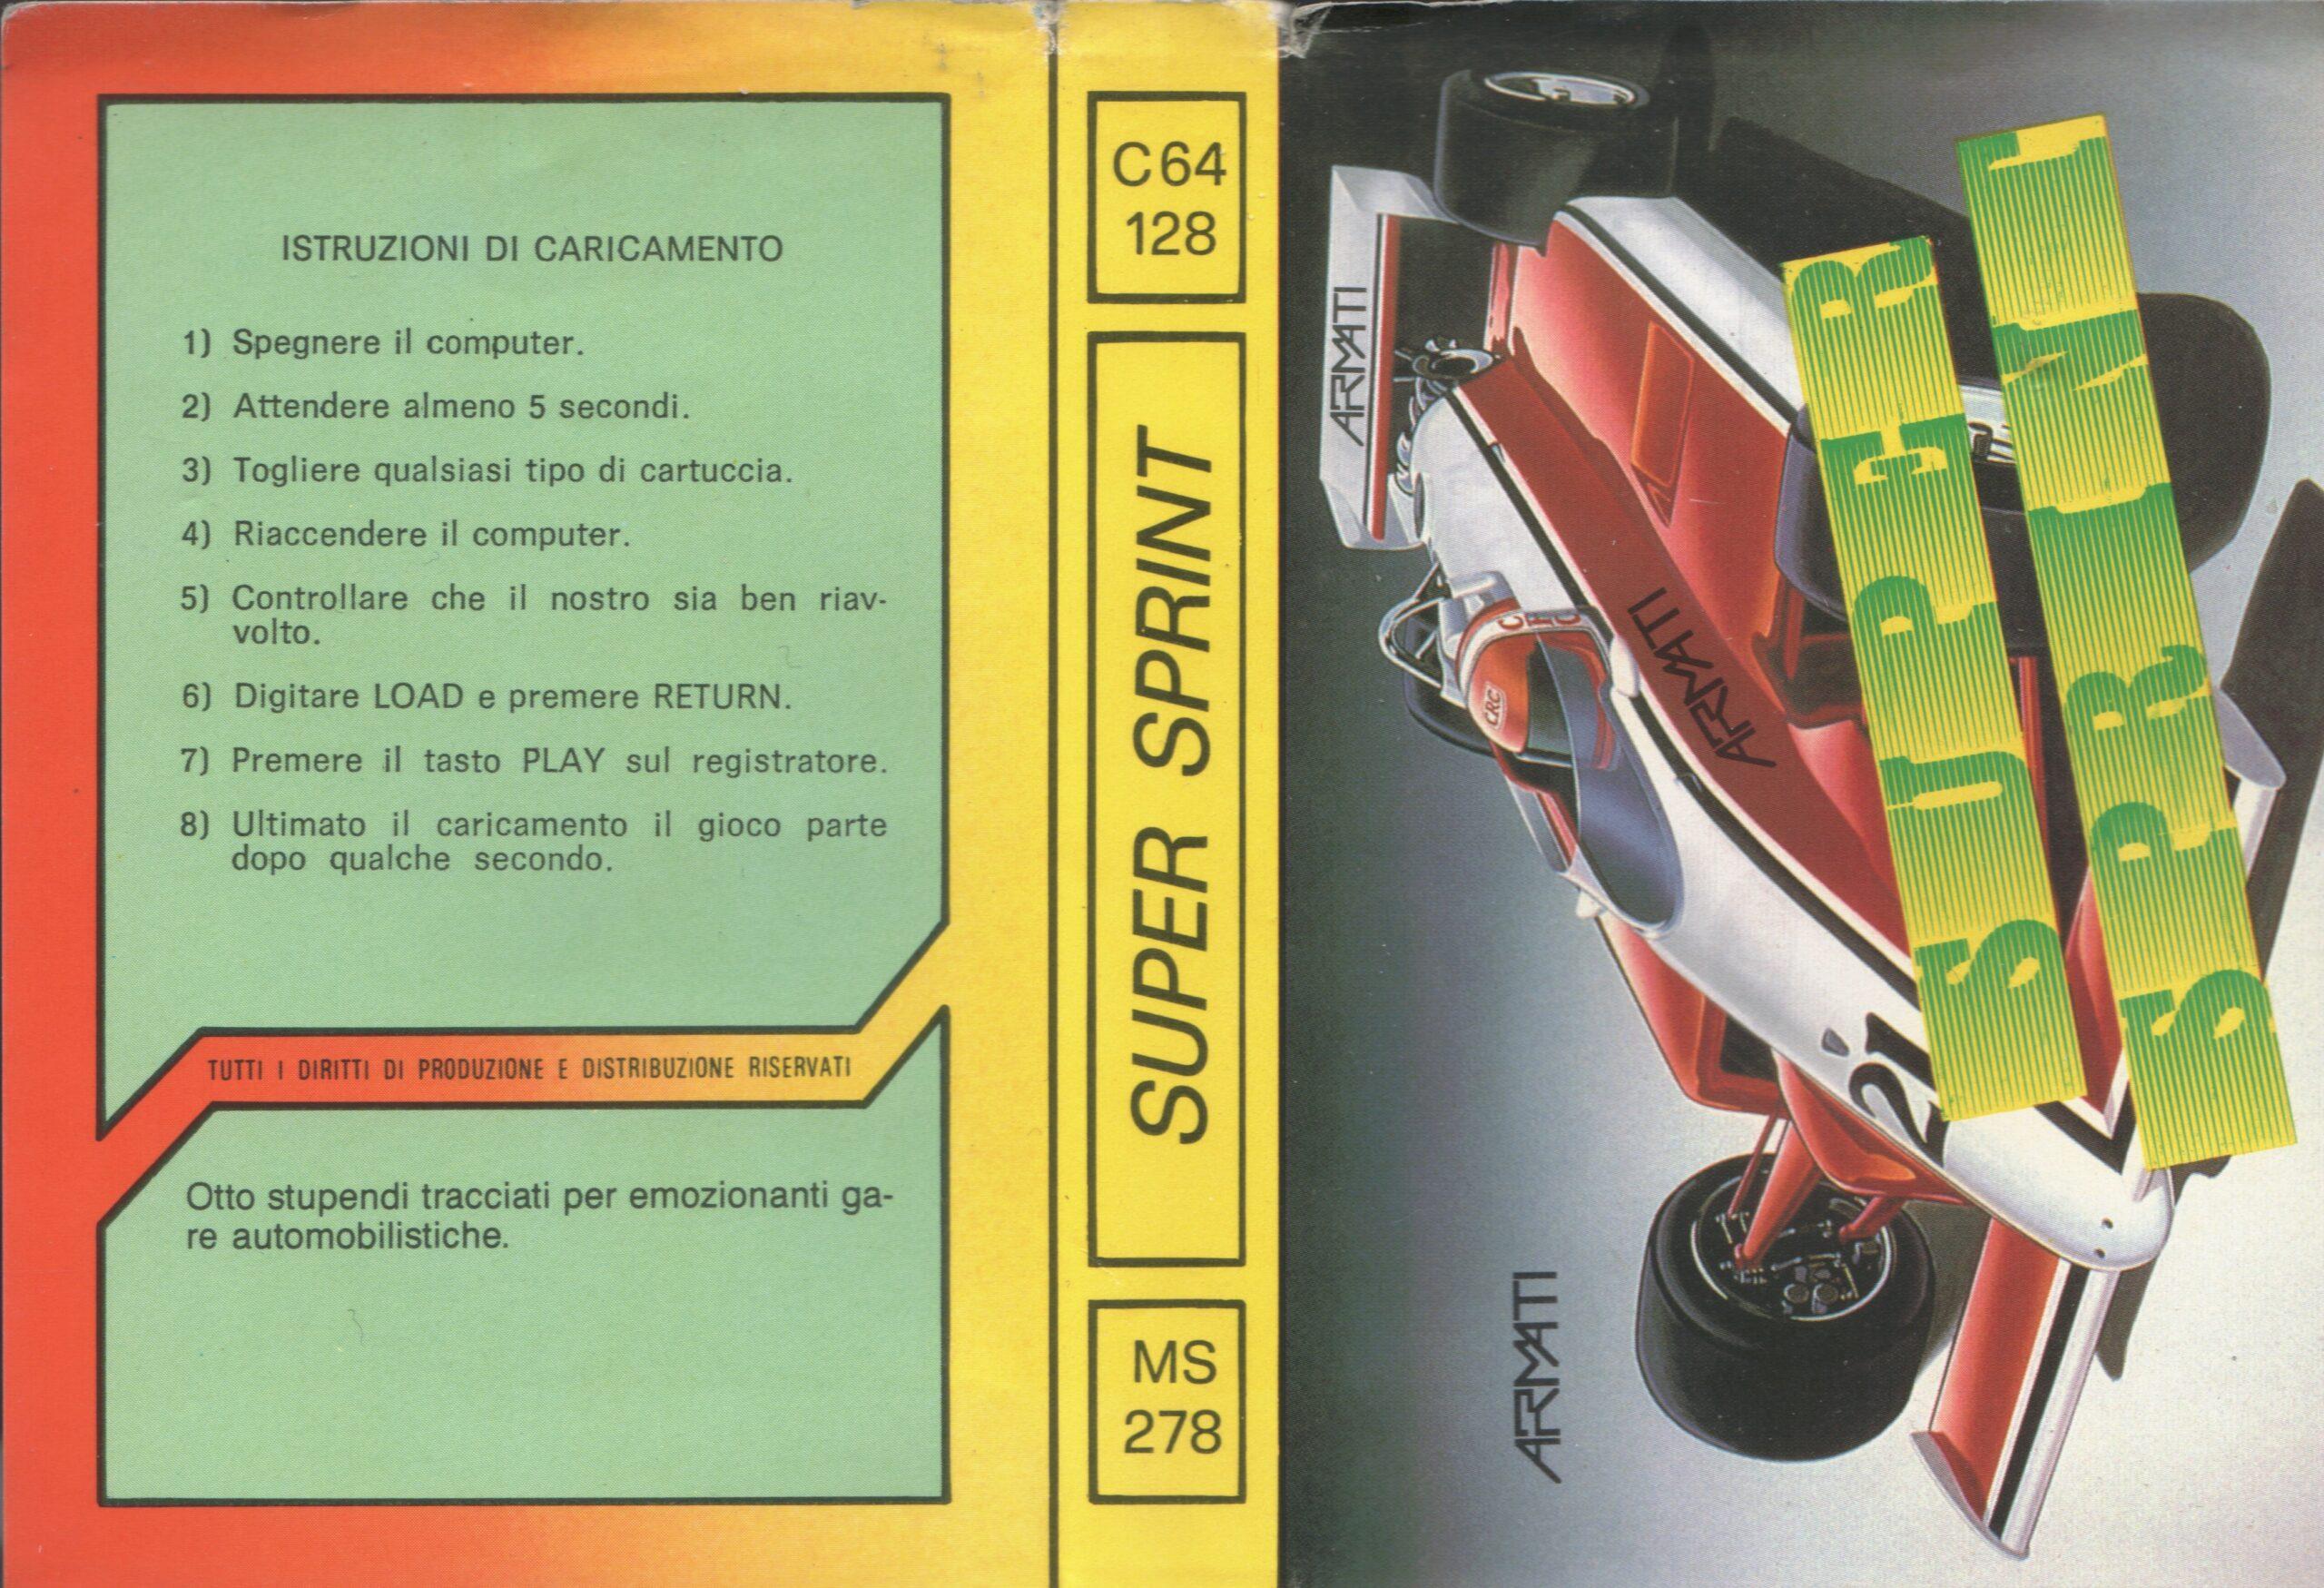 SUPER SPRINT MS 278